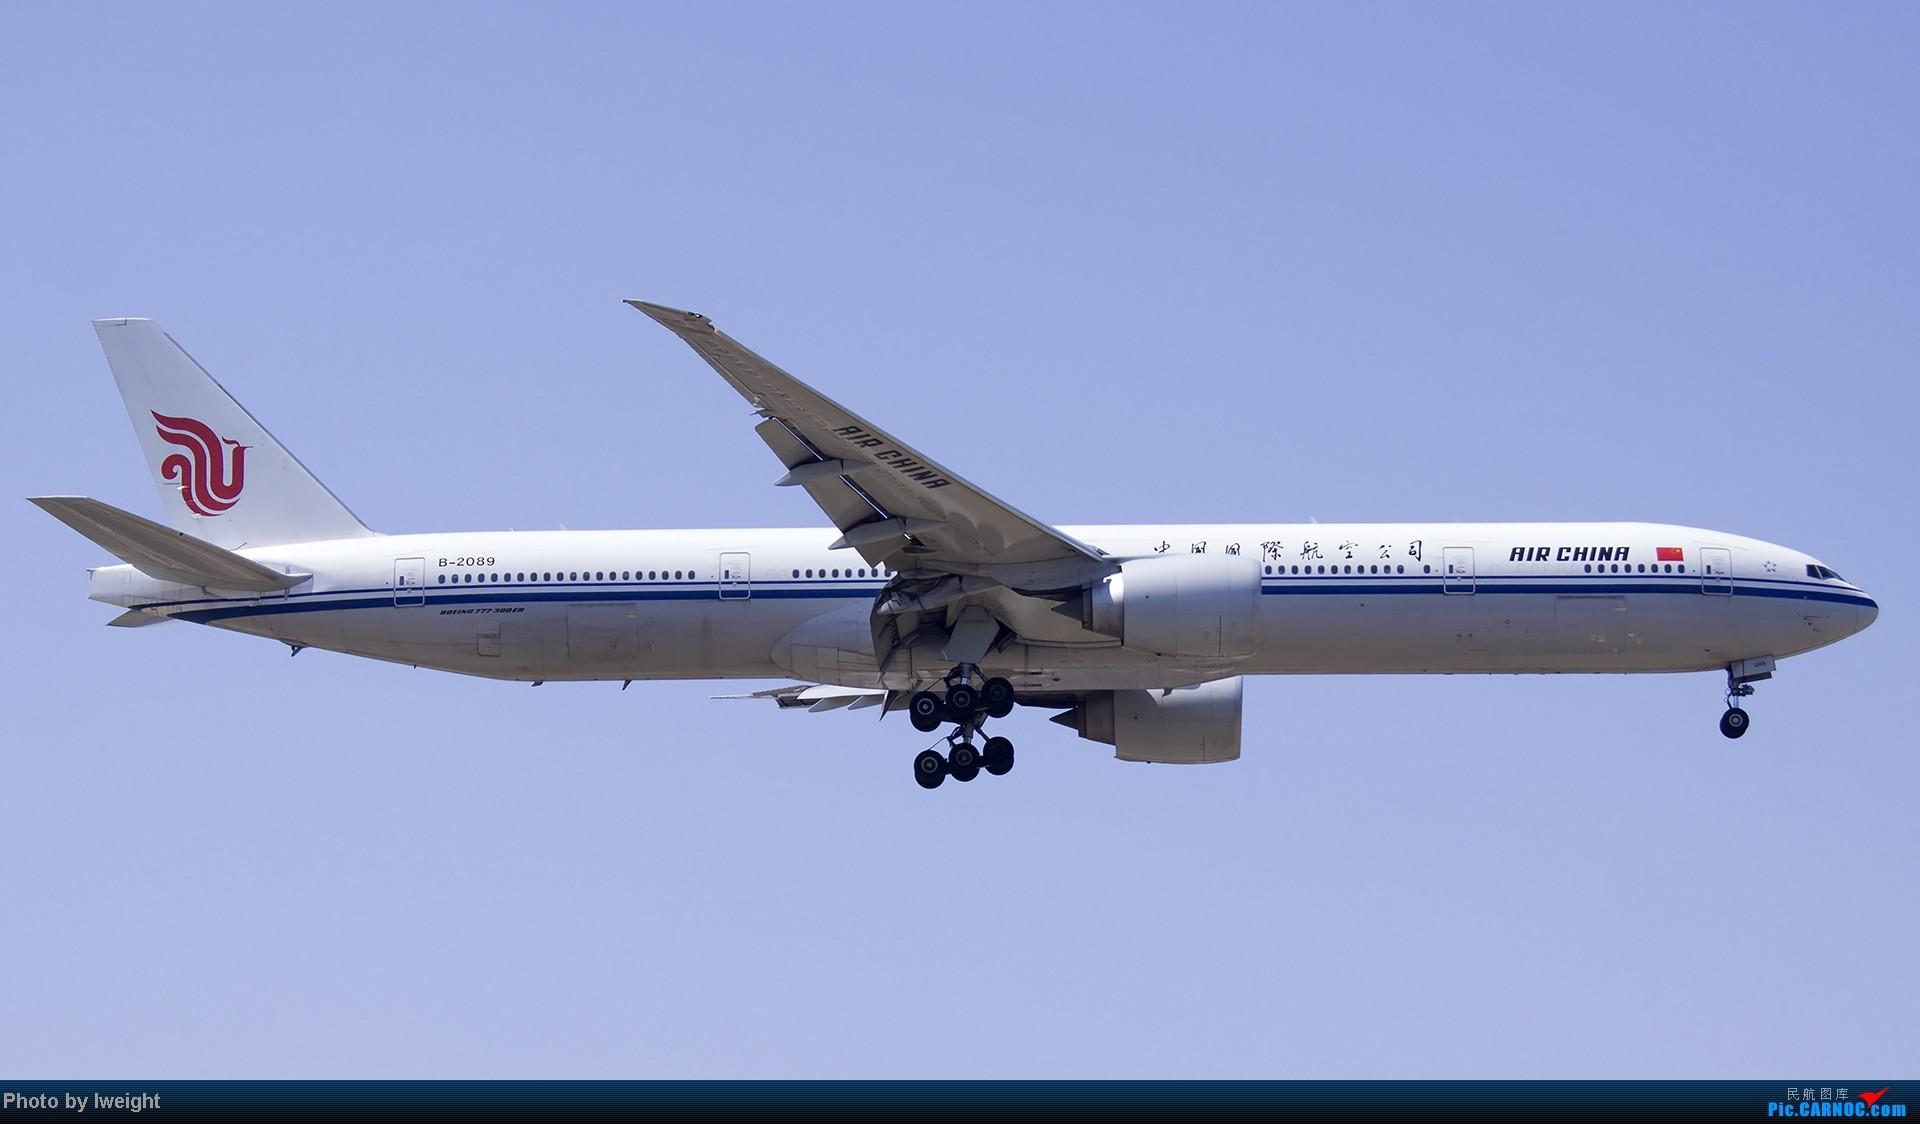 Re:[原创]北京难得的好天气,收获多种机型和彩绘,遗憾的是再次错过卡航巴塞罗那彩绘 BOEING 777-300 B-2089 中国北京首都机场